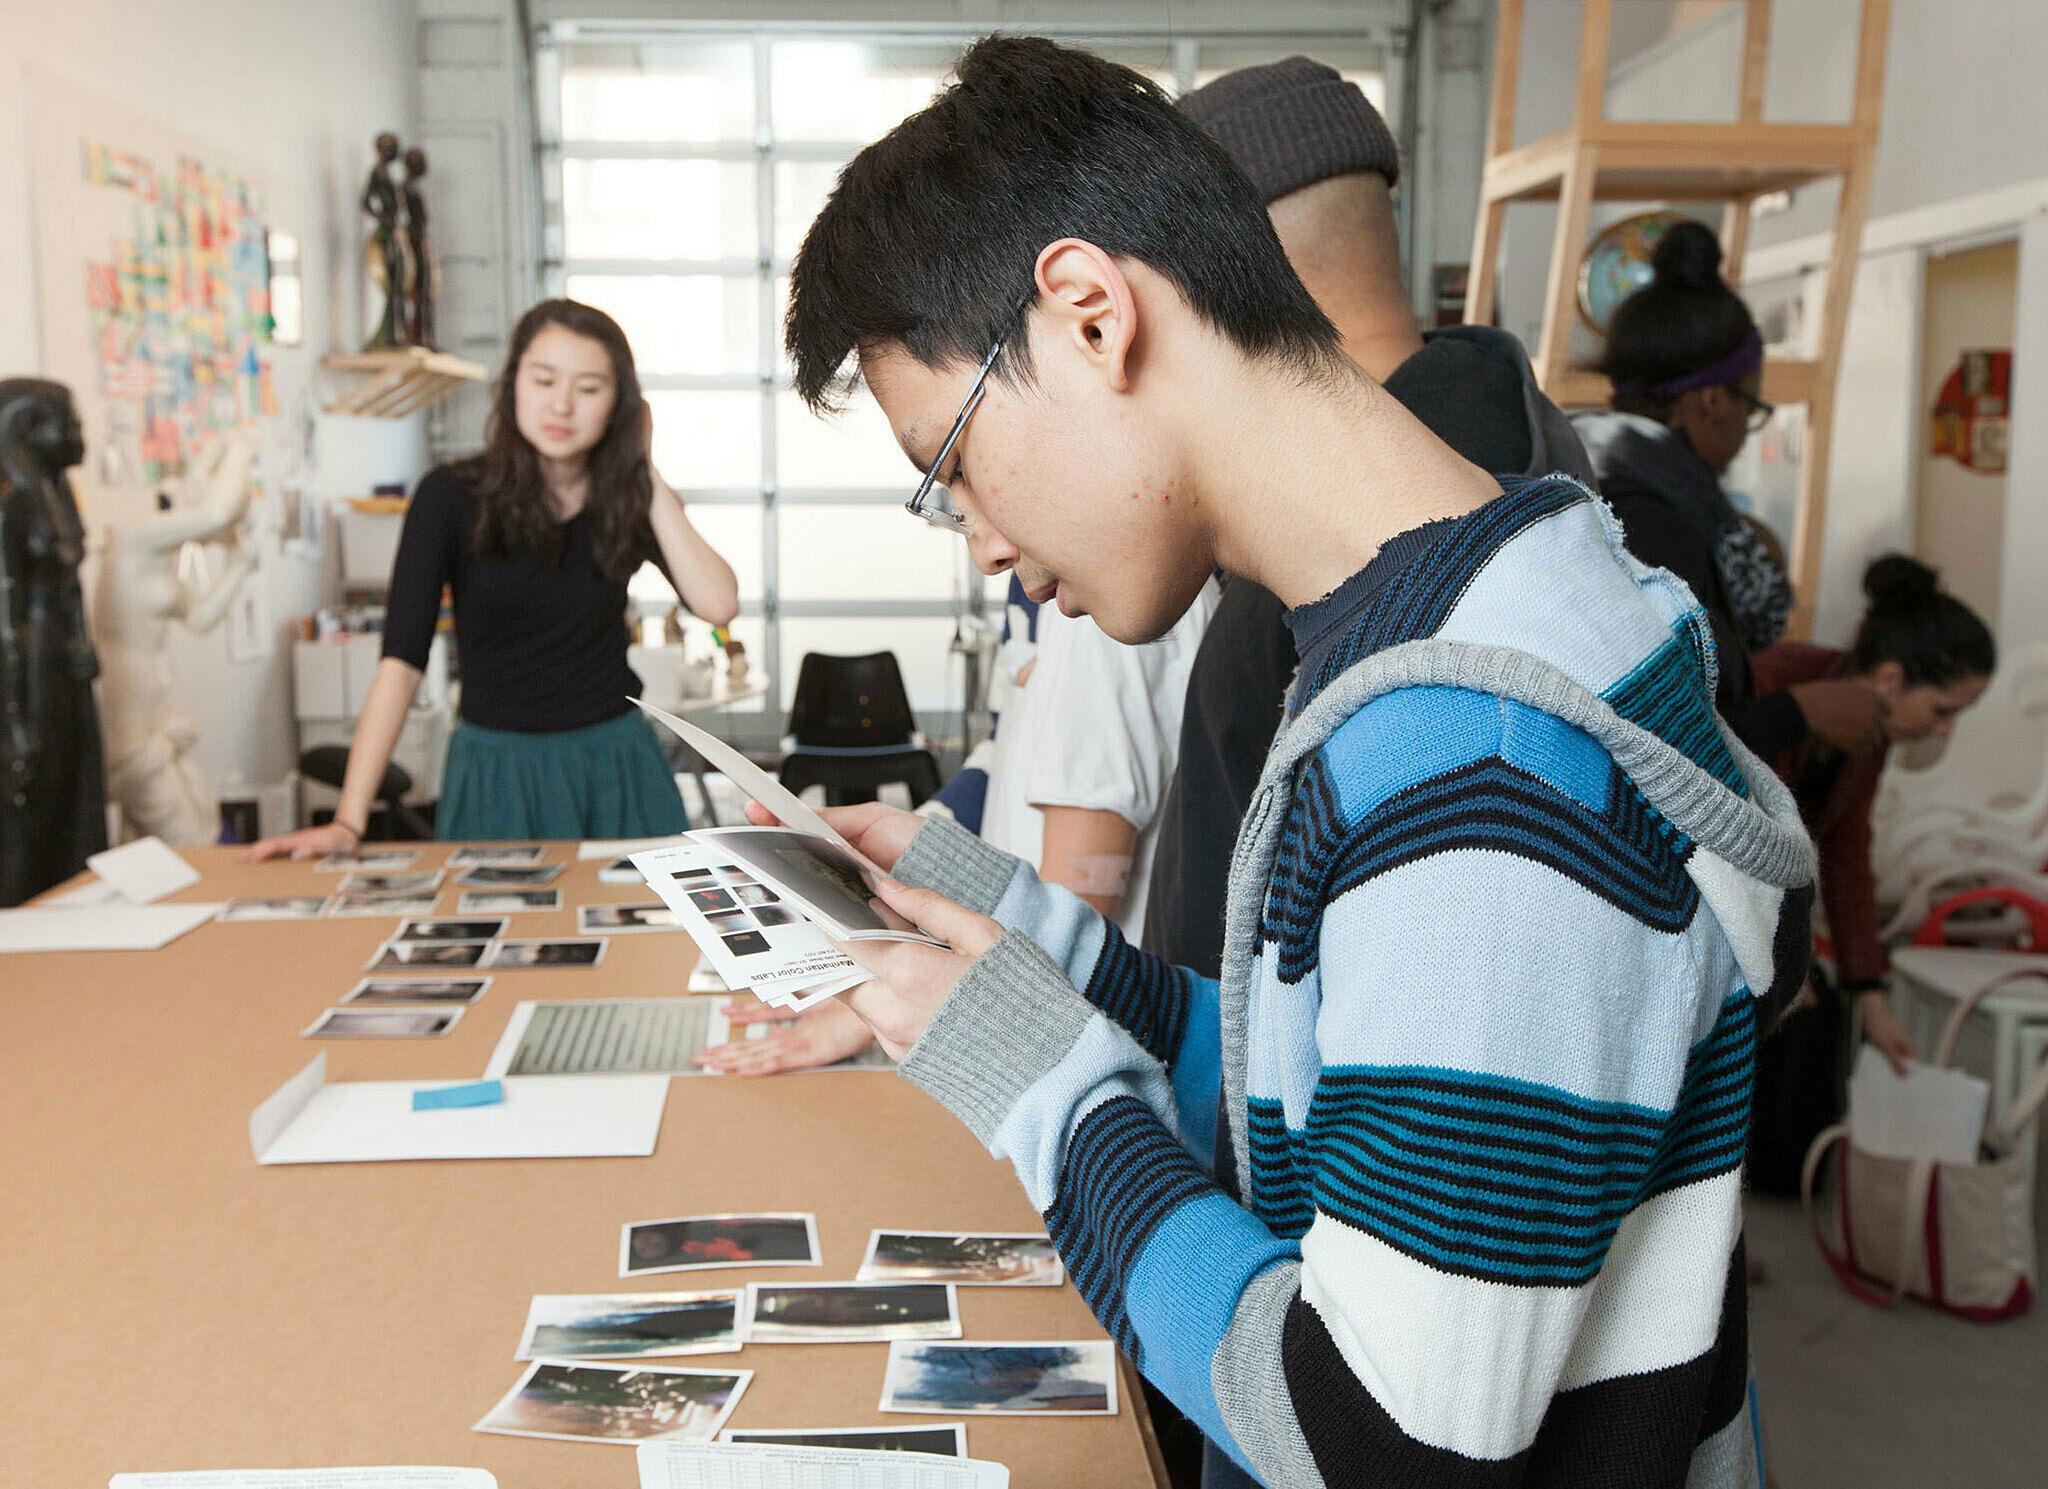 Students go through photographs.